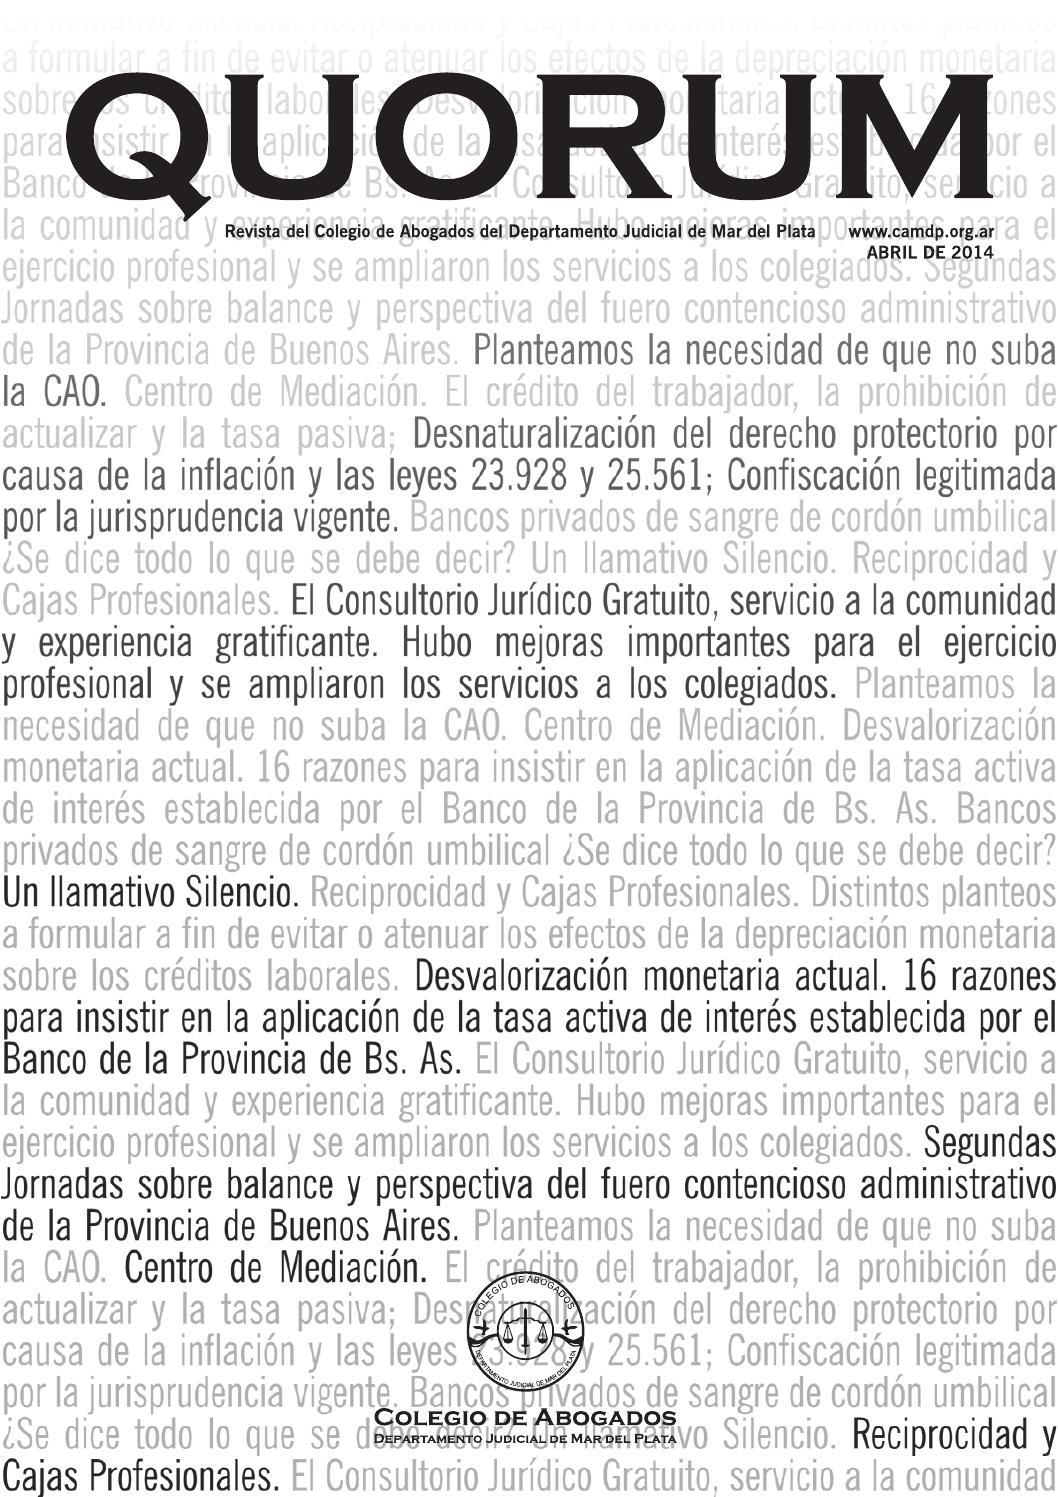 Revista CAMDP Quorum 2014 by omar can - issuu 3d999b1cbf8c